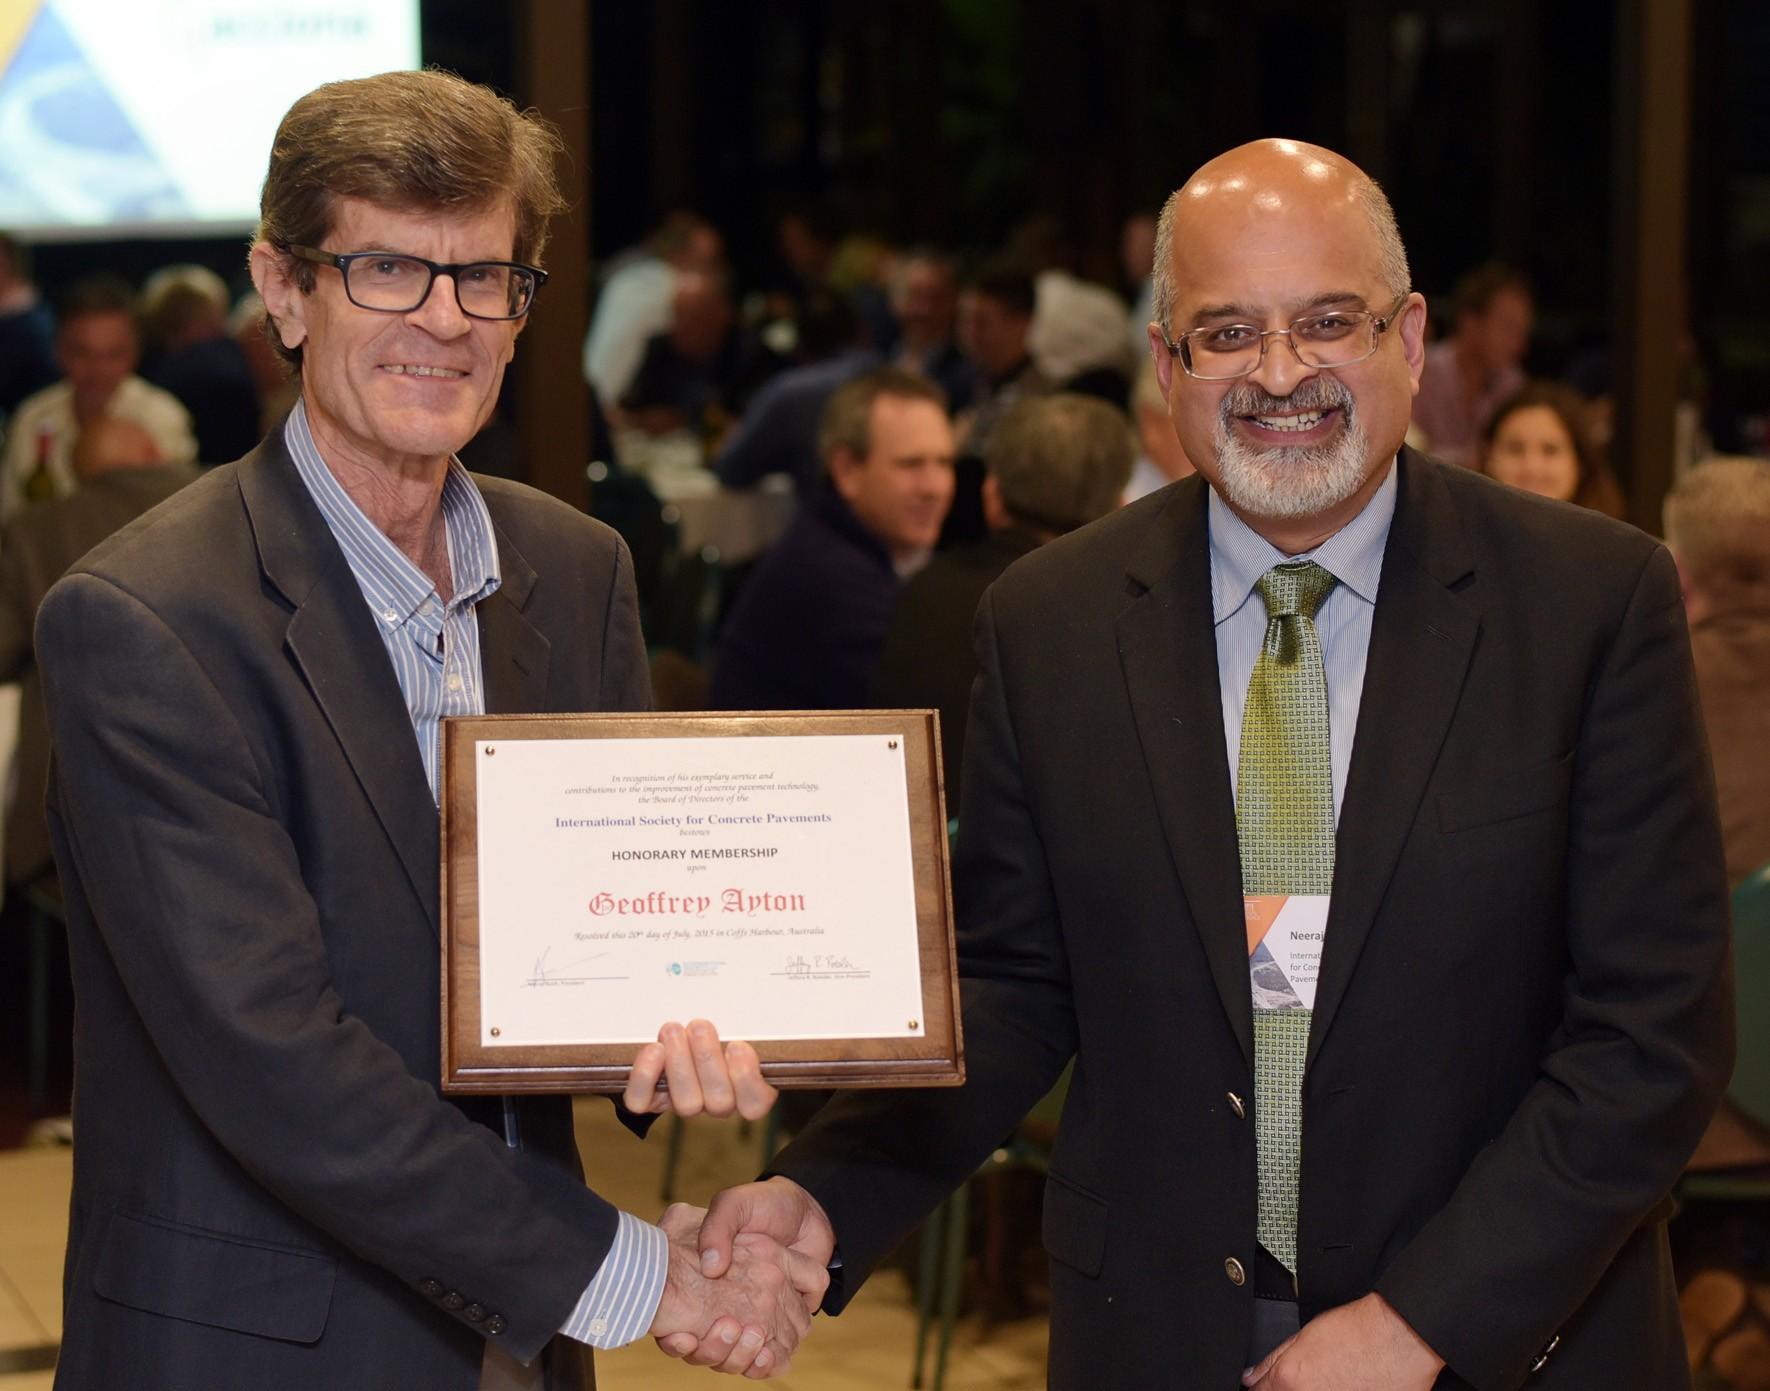 ISCP Names Geoff Ayton Honorary Member